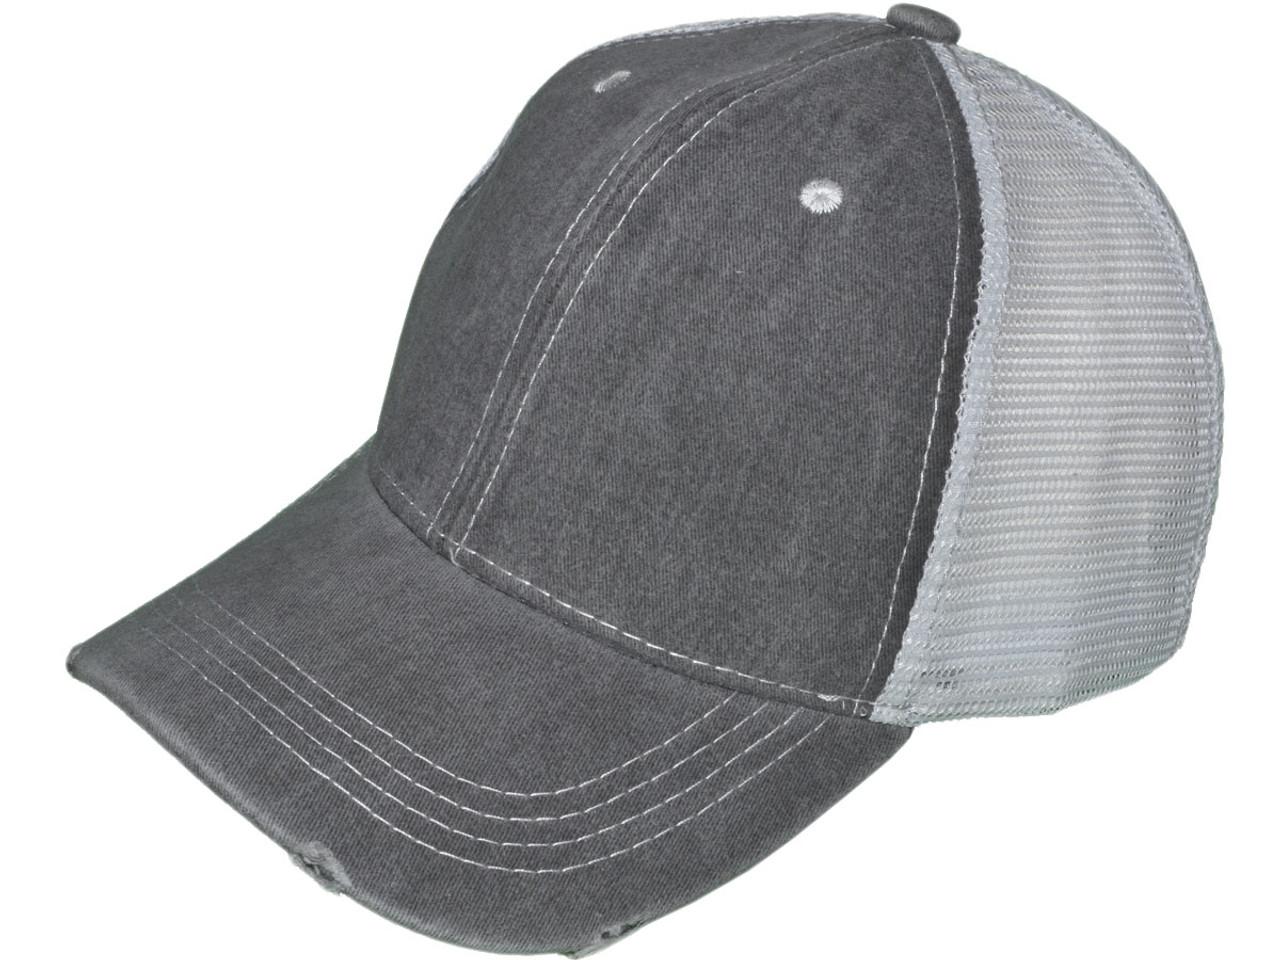 b9b81eb673d Distressed Baseball Caps Wholesale - Parchment N Lead